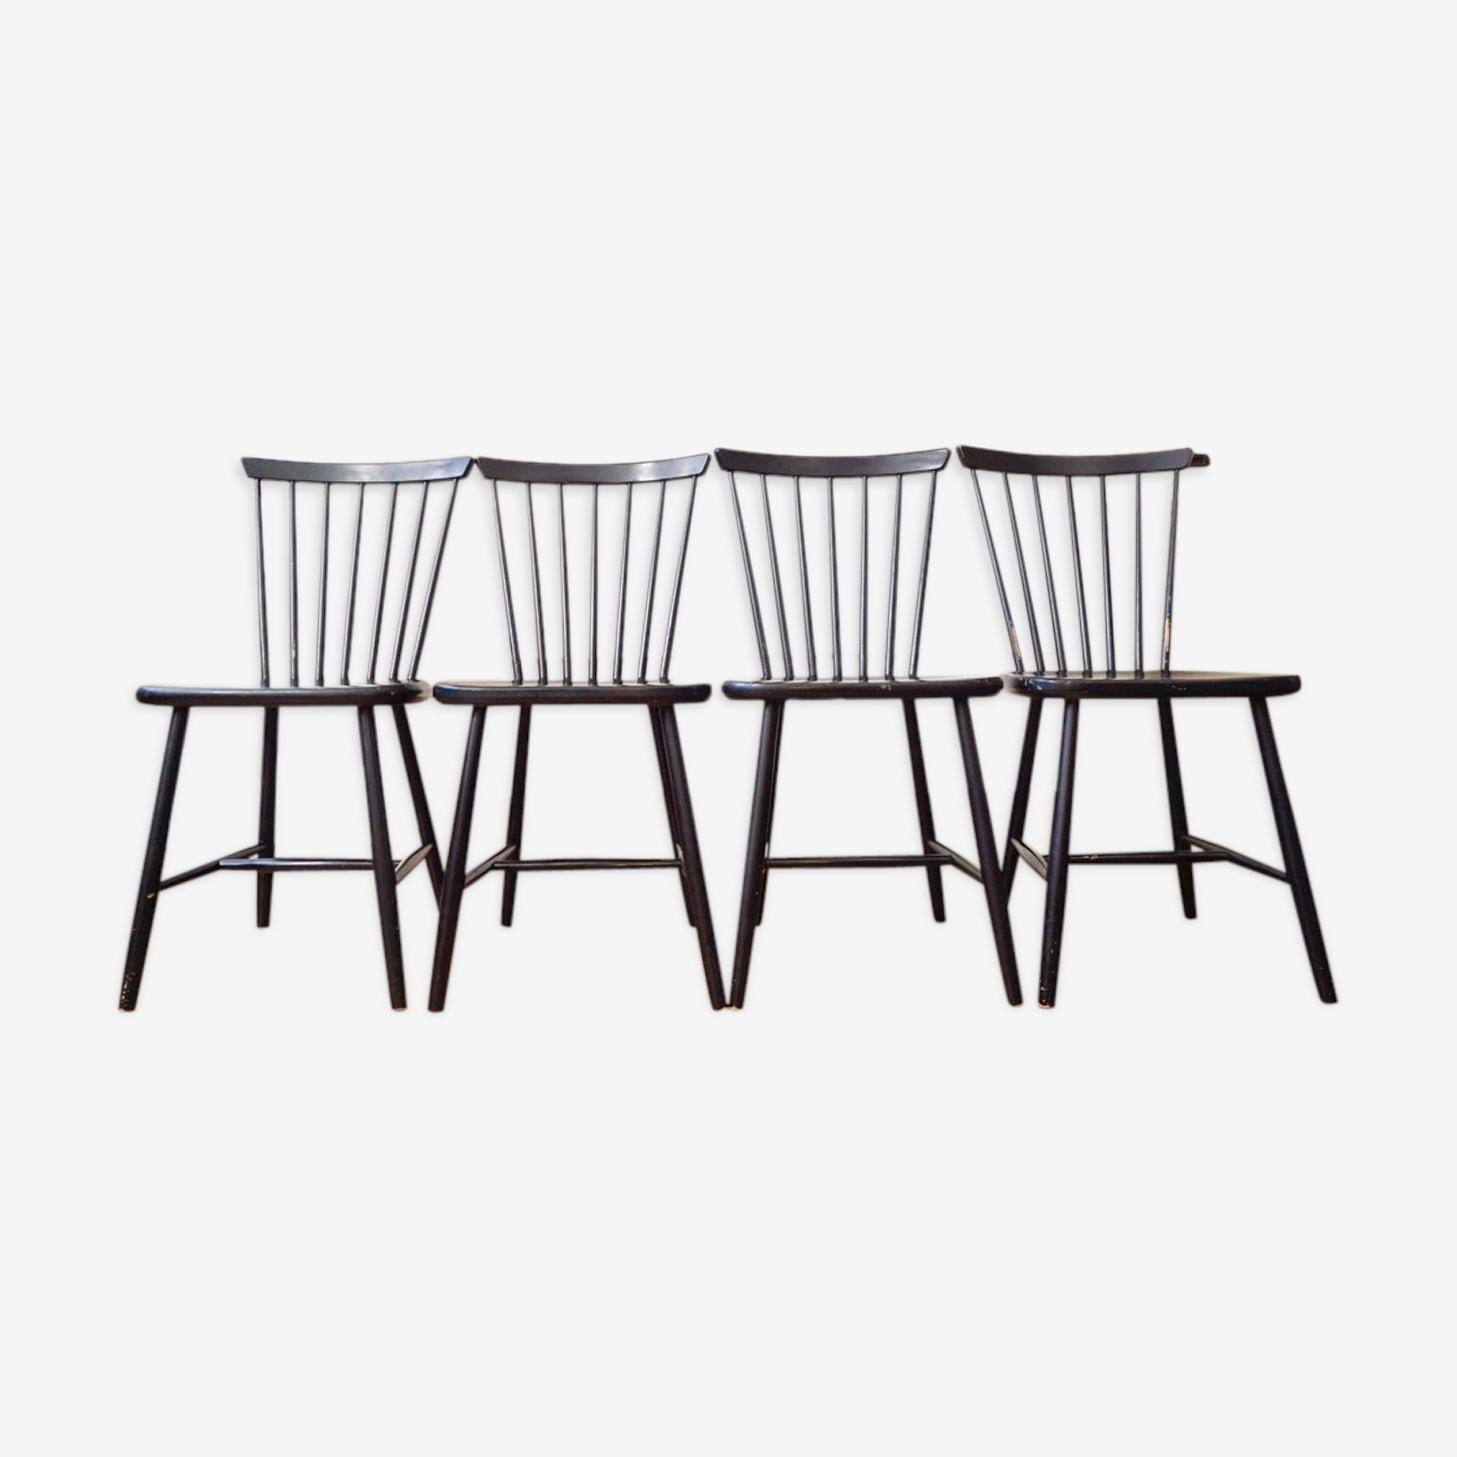 Series 4 chairs made in Sweden by Edsby Verken